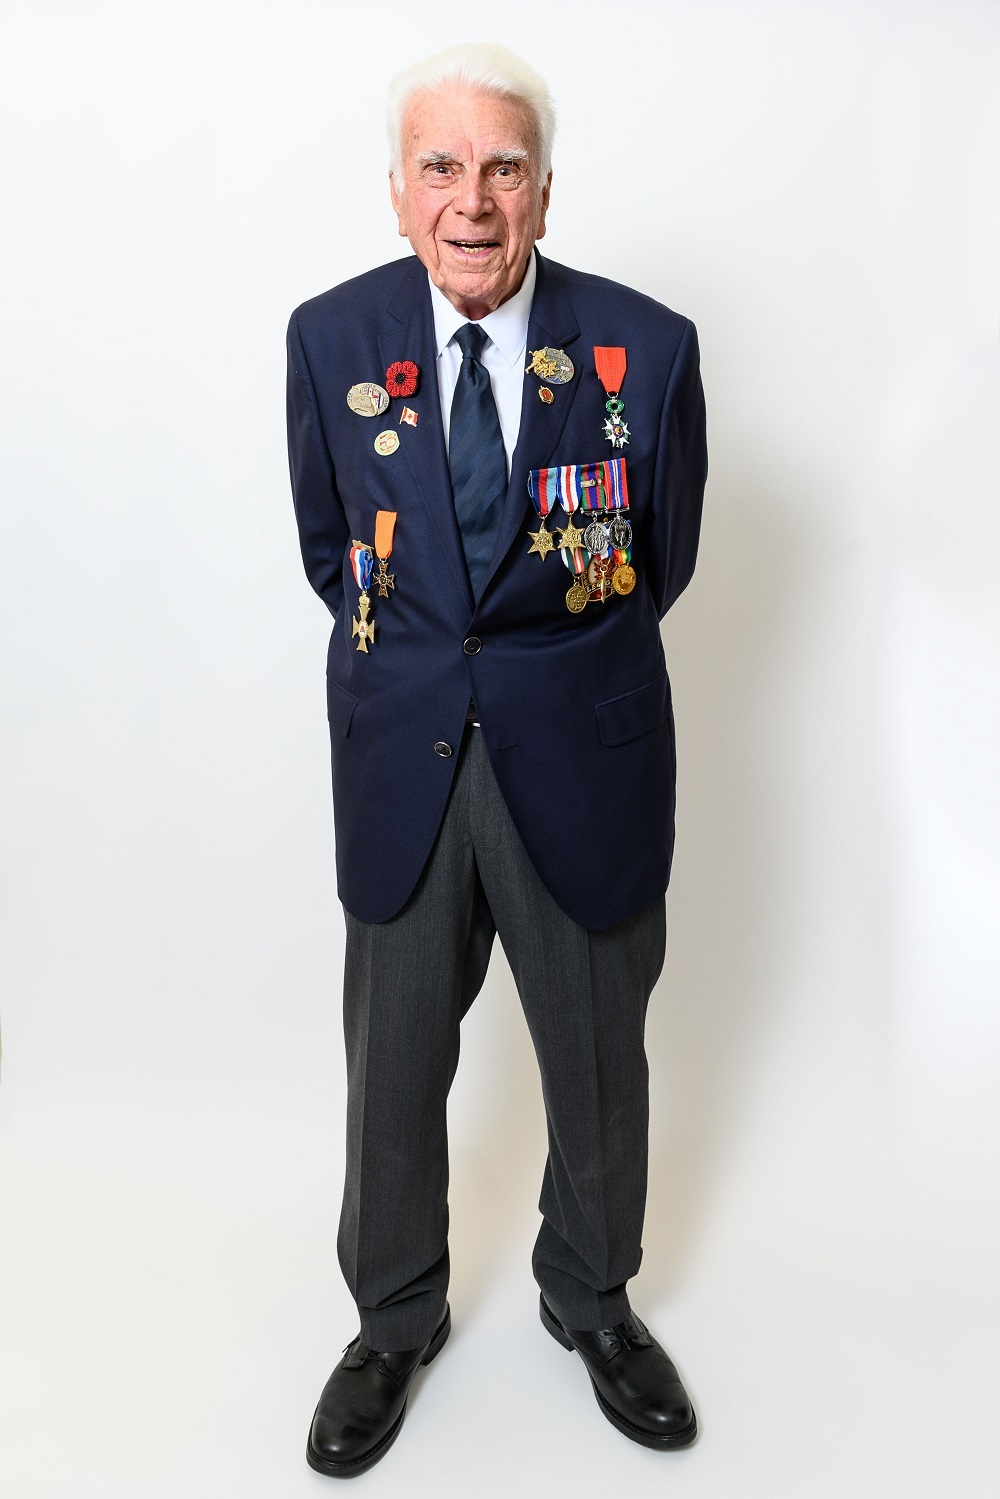 Sergeant (Ret'd) Norman Kirby